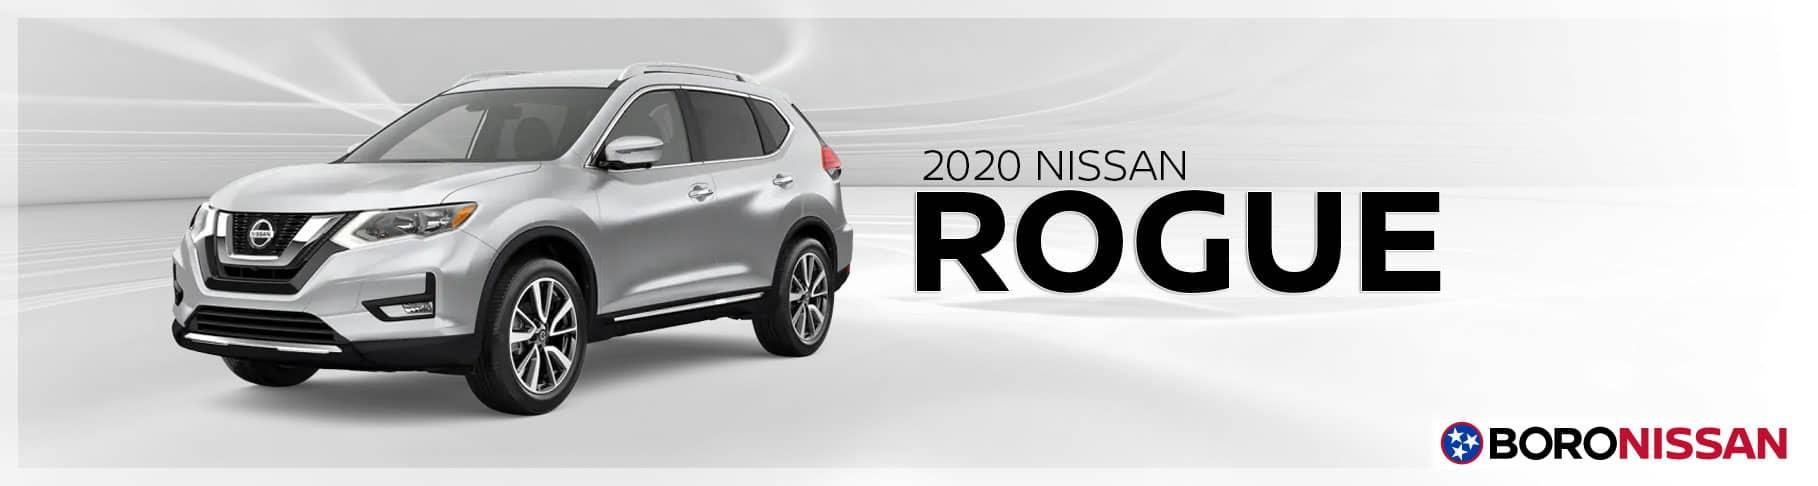 The New 2020 Nissan Rogue Near Nashville, TN